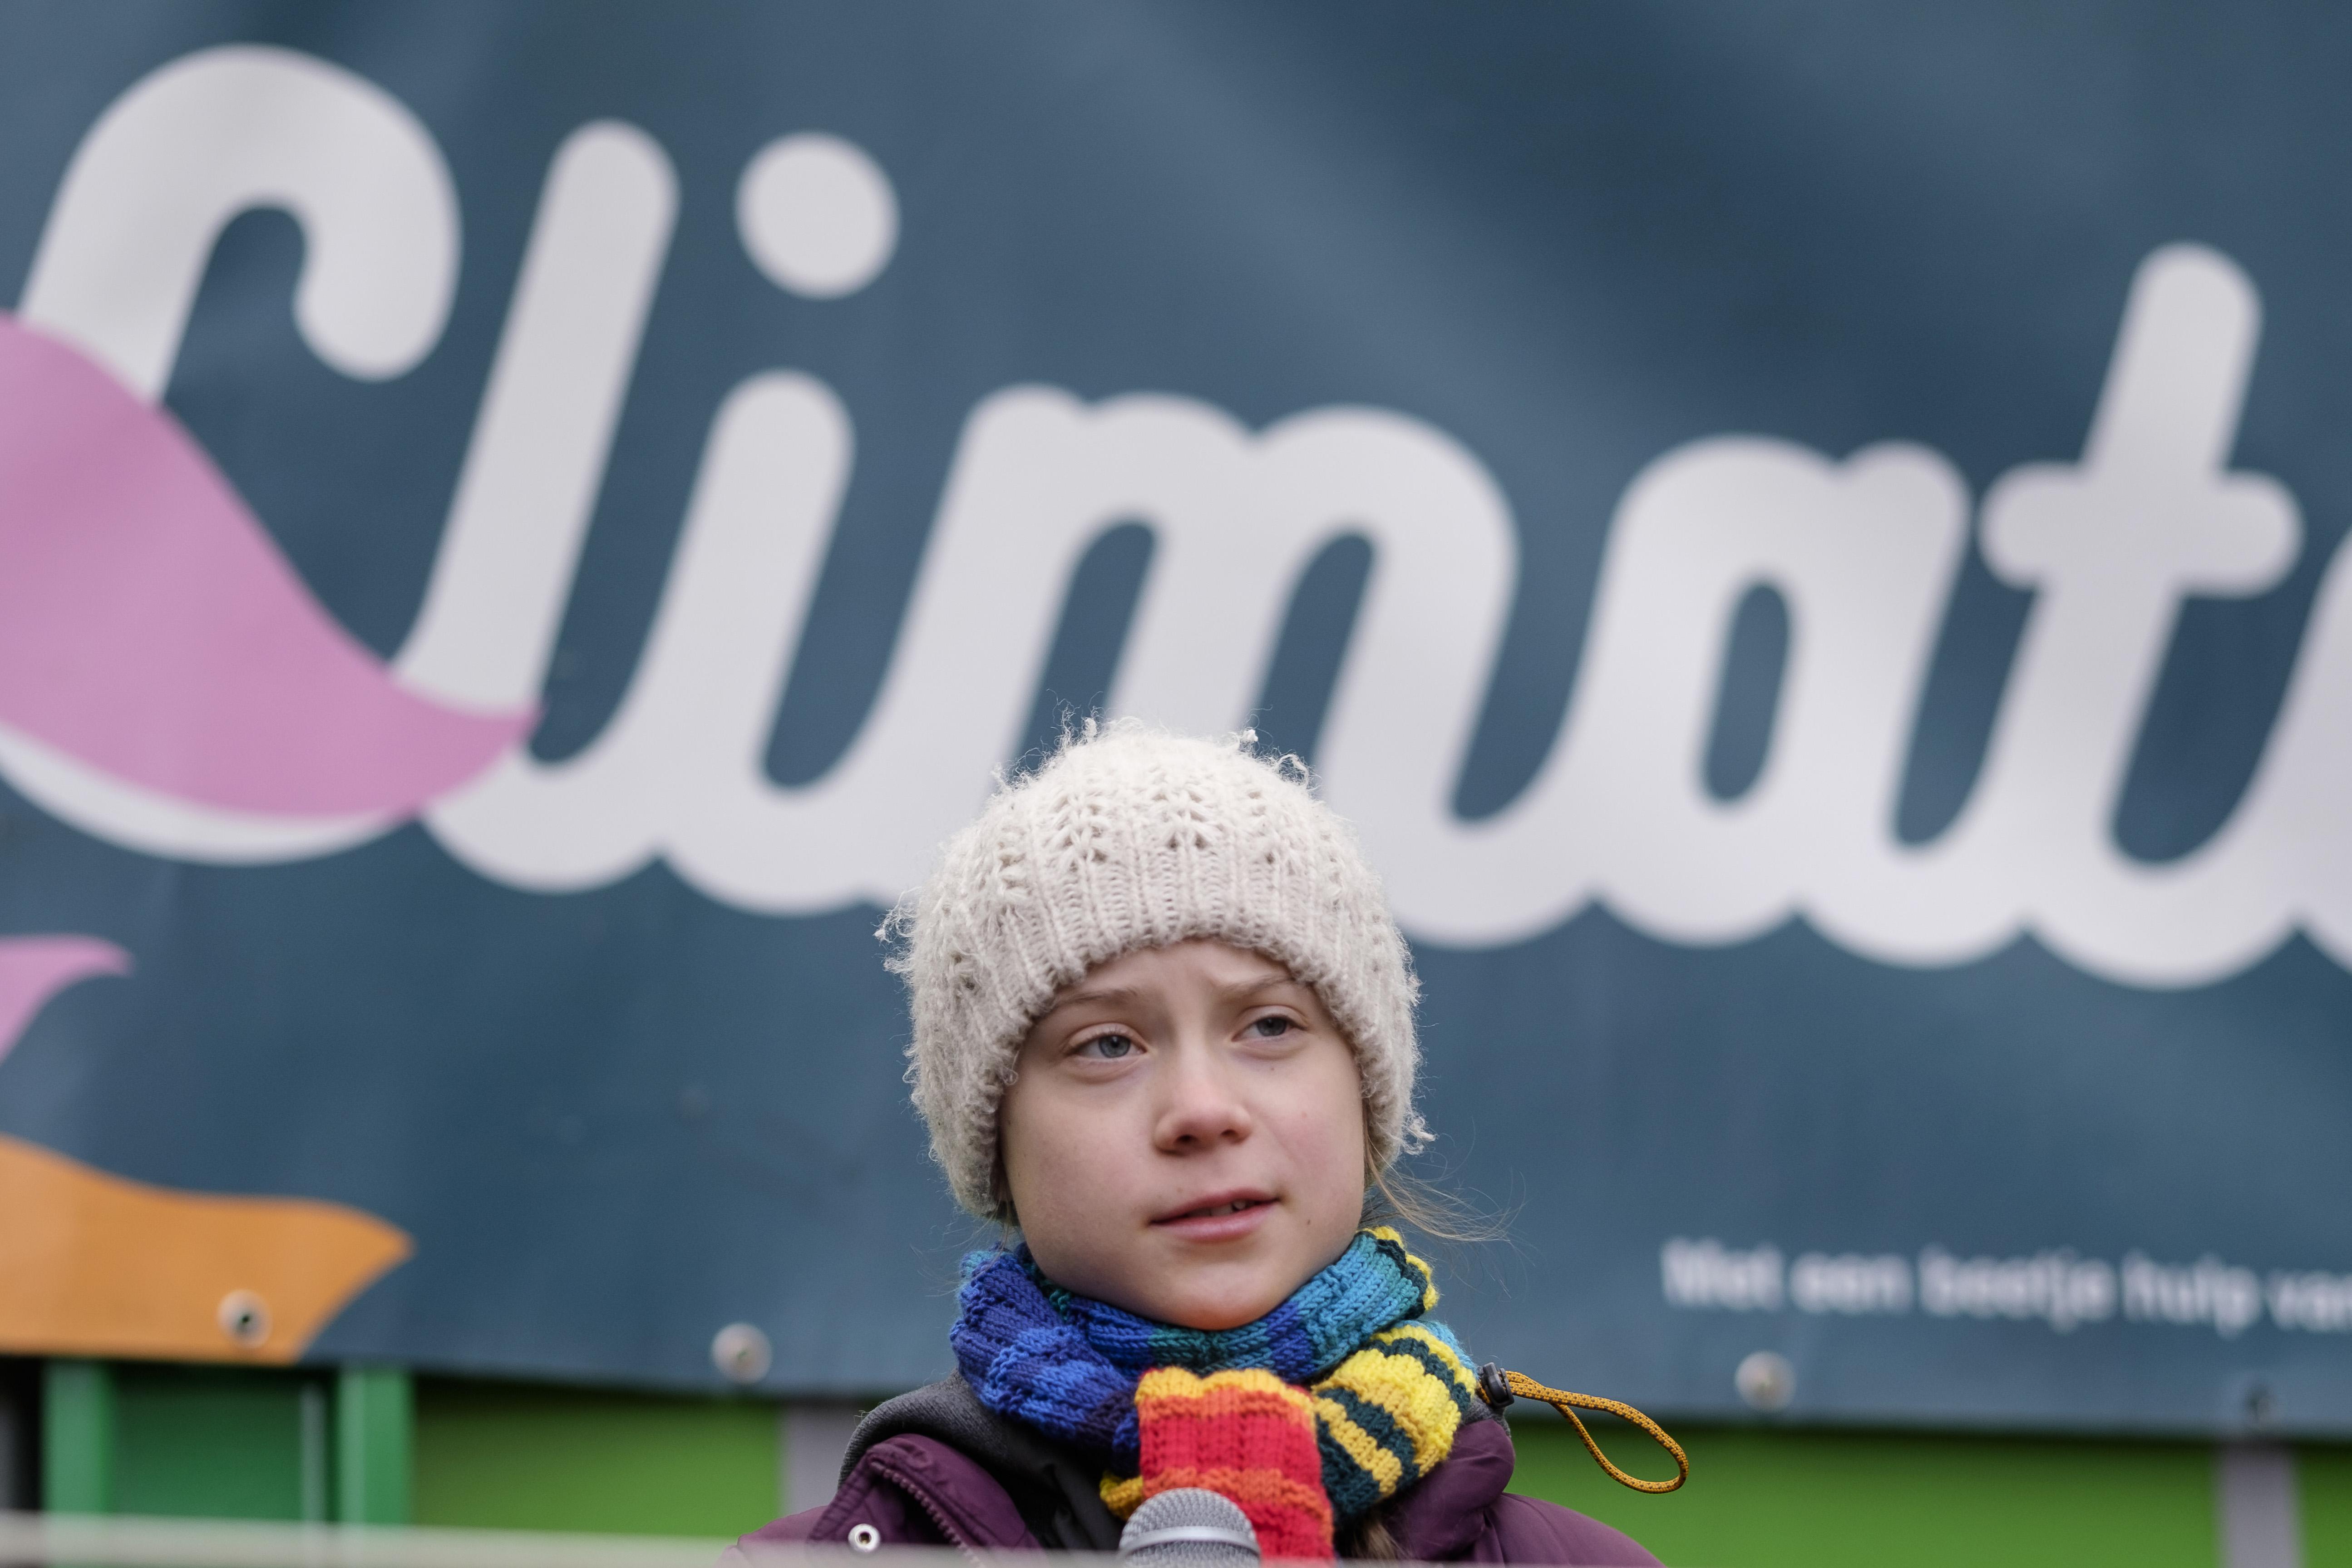 Swedish Environmentalist Greta Thunberg